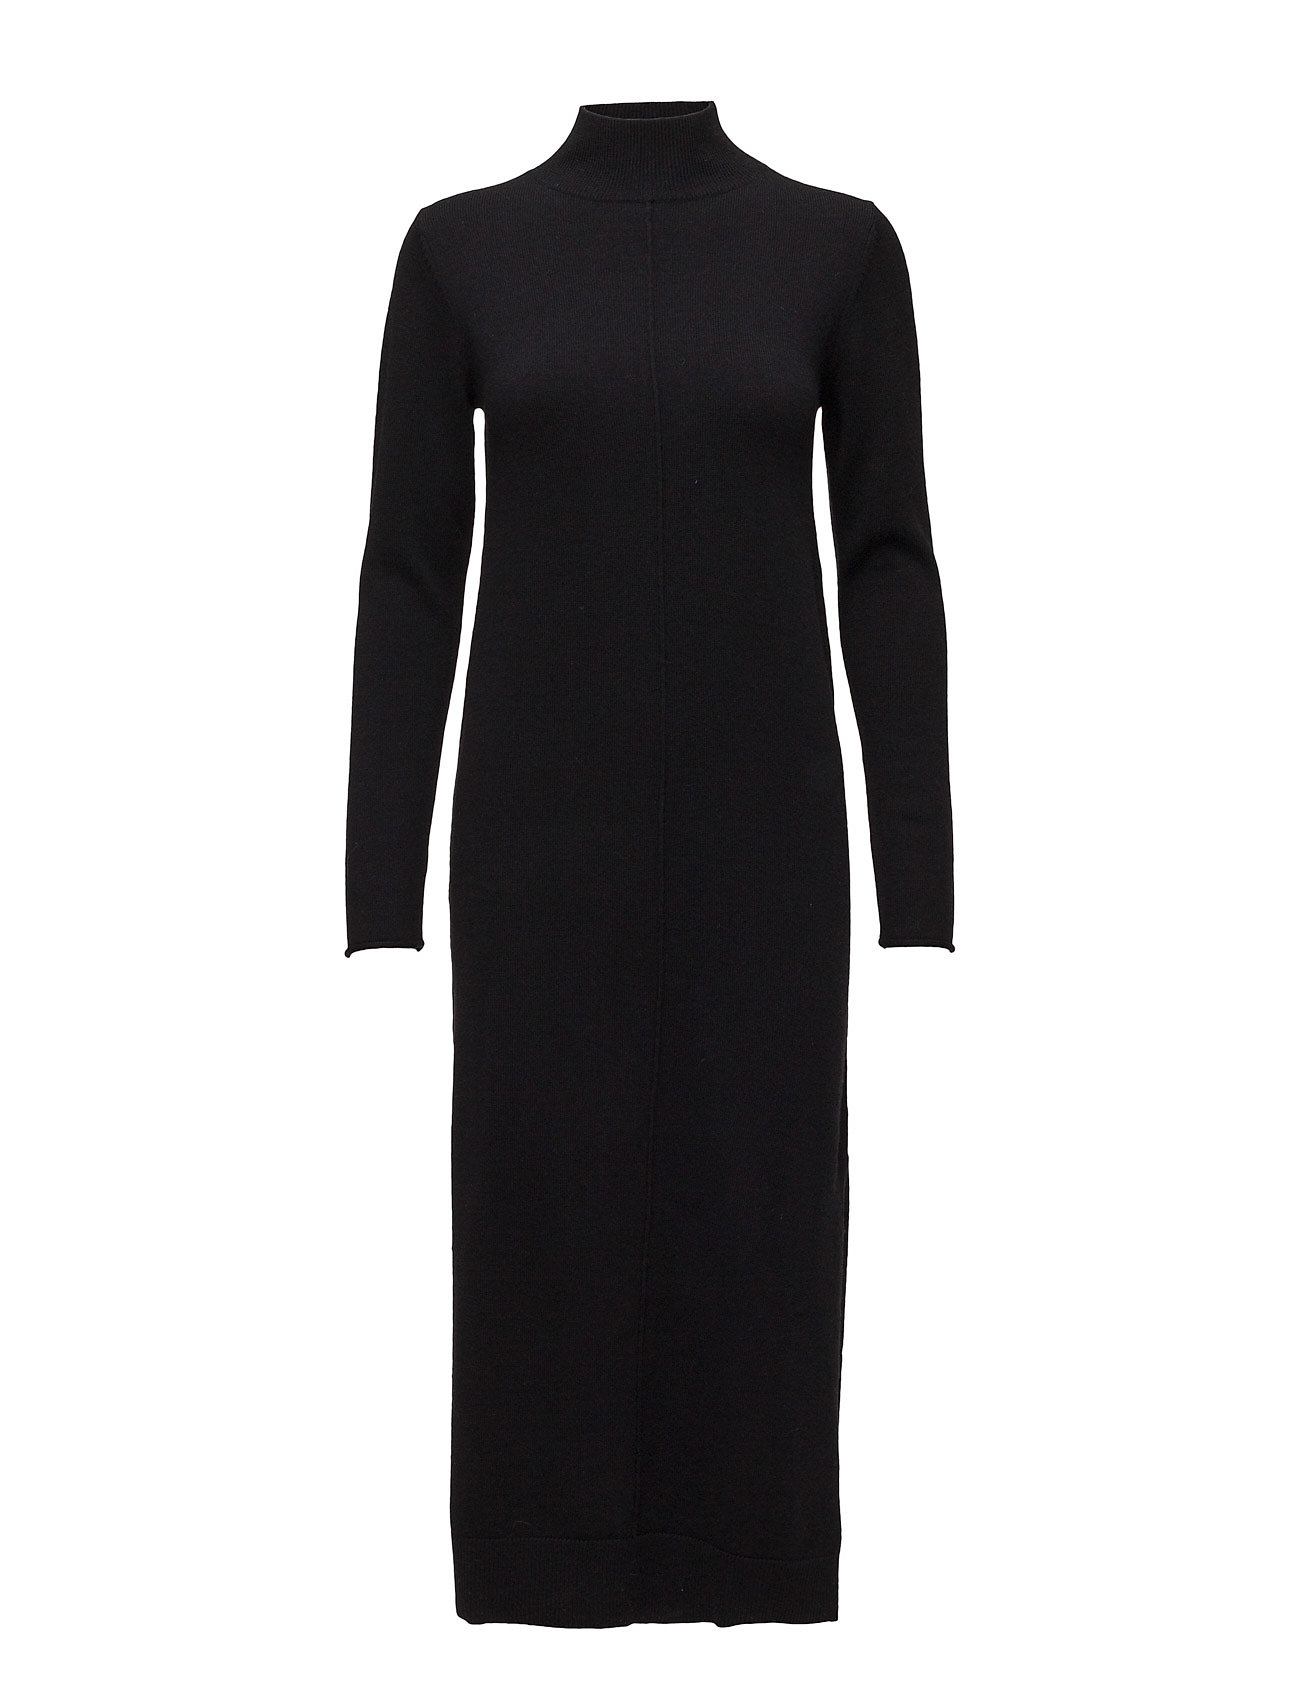 Dress Filippa black Tunic Long £107 K WROwqvWx78